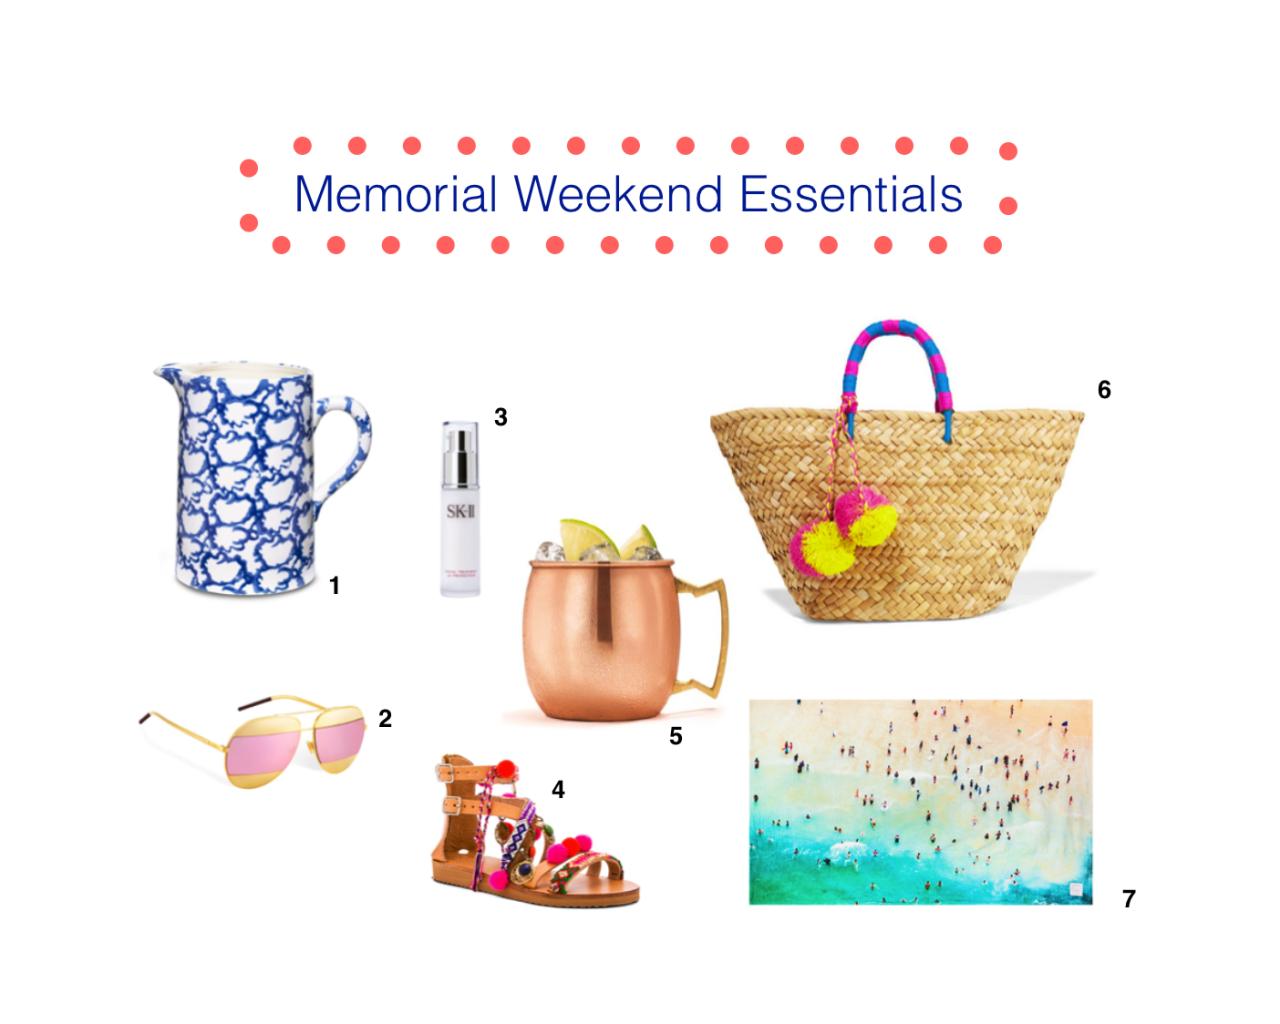 memorial weekend essentials